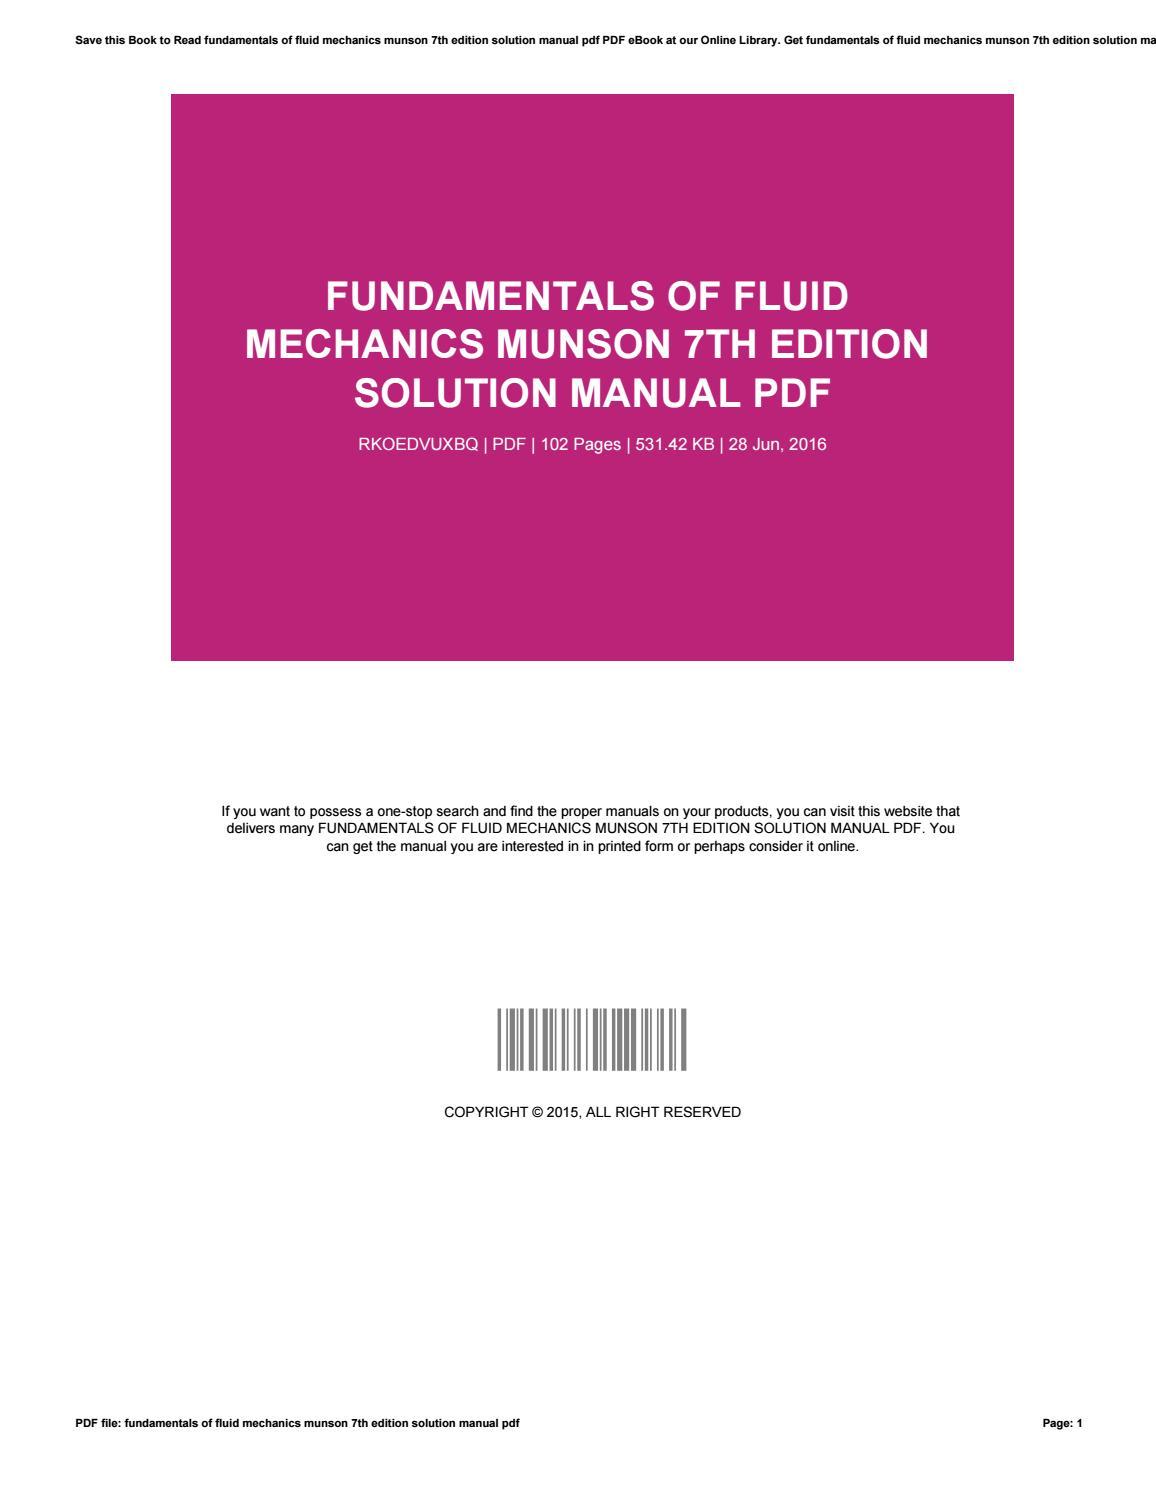 Fundamentals of fluid mechanics 8th edition pdf dolapgnetband fundamentals of fluid mechanics 8th edition pdf fandeluxe Images